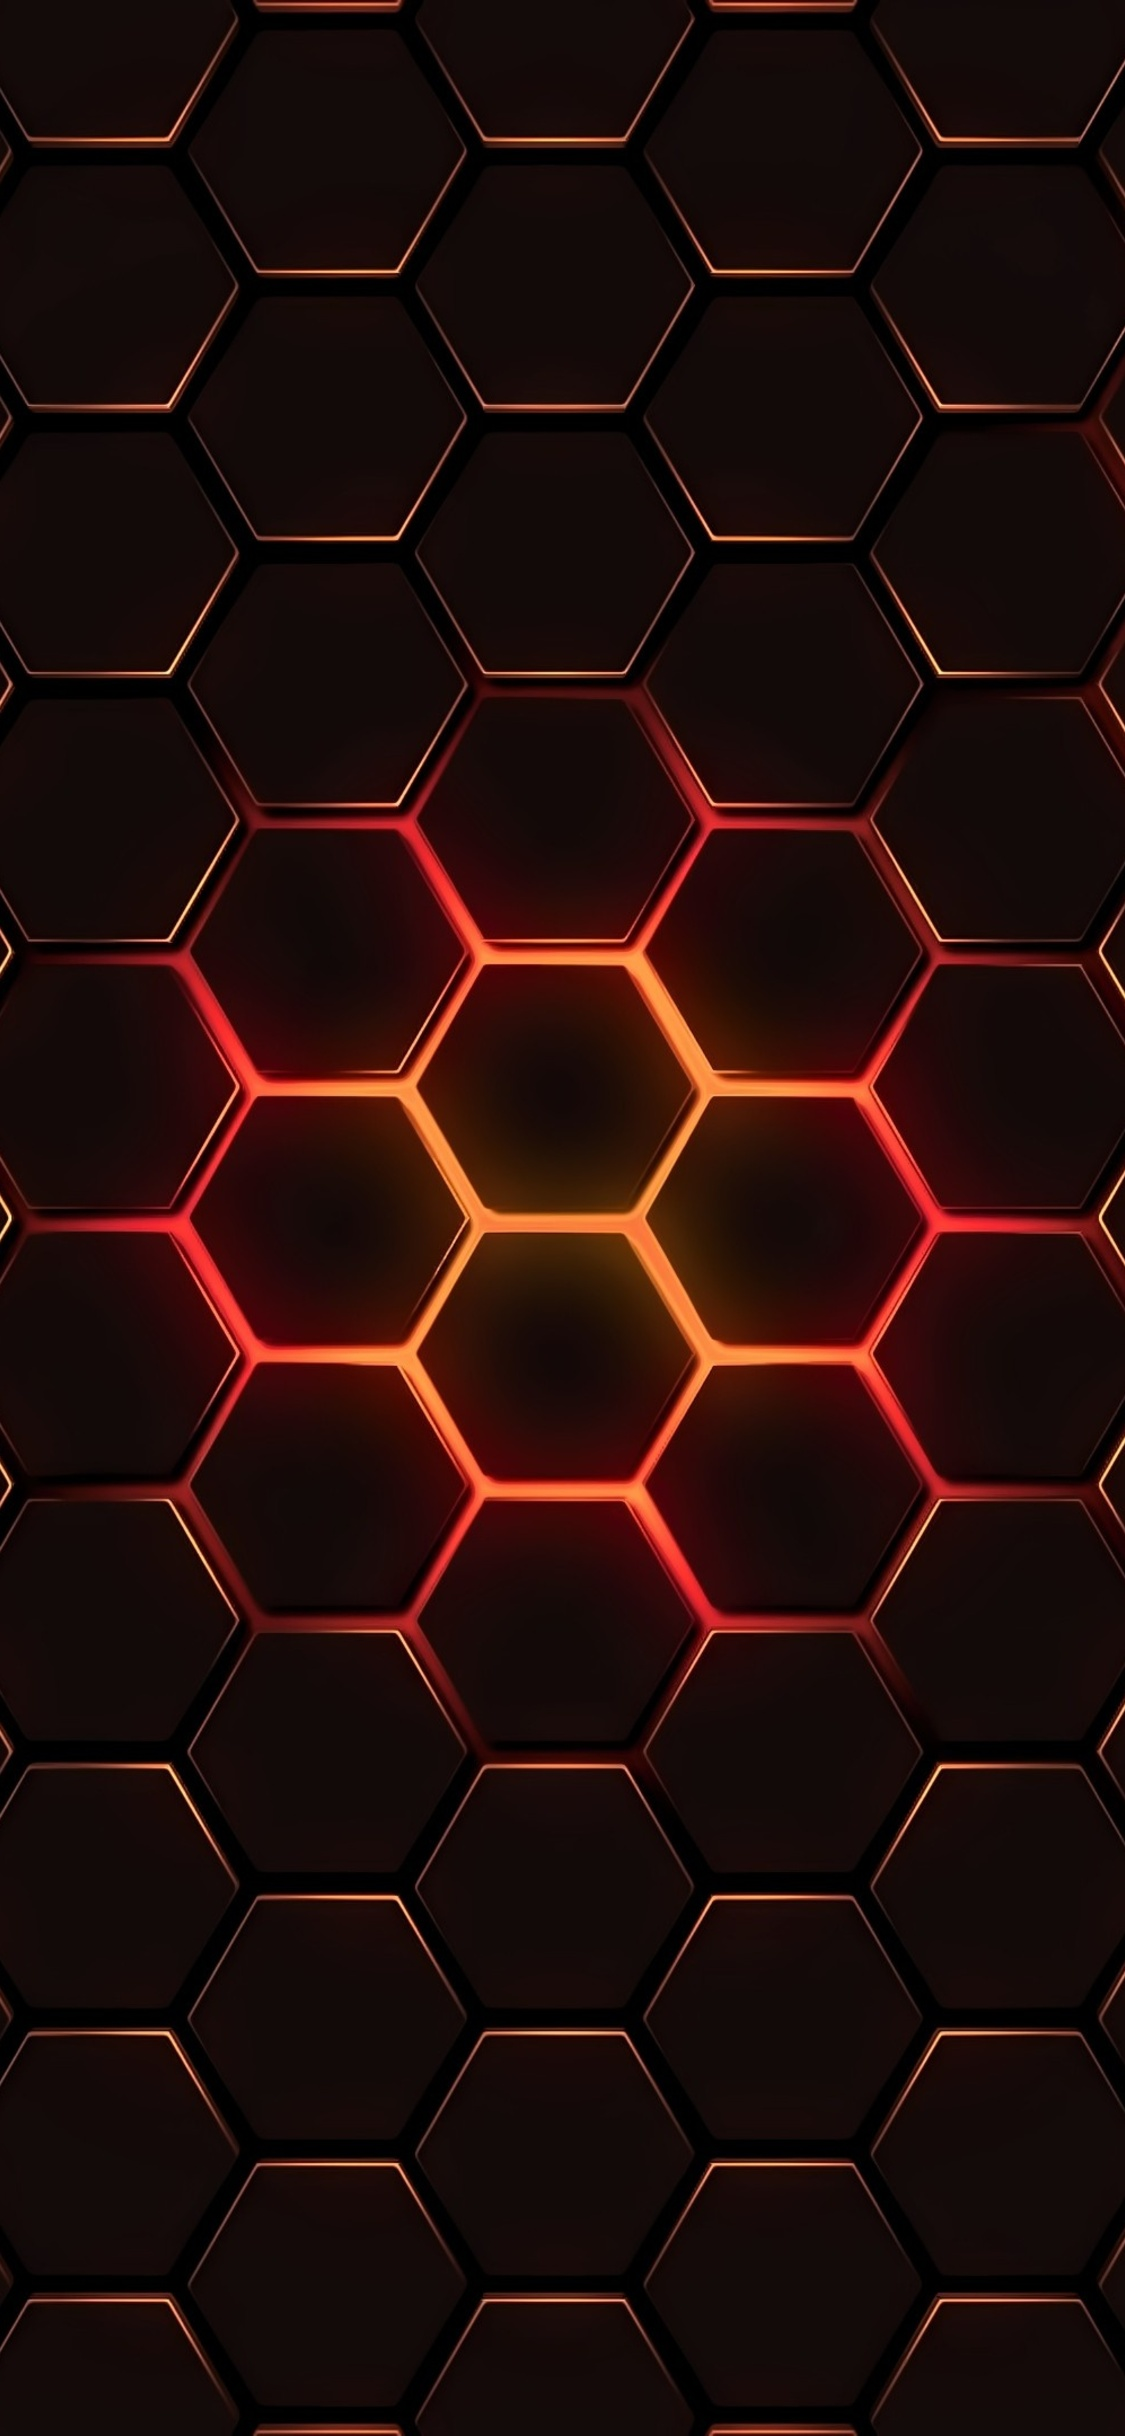 1125x2436 Hexagon Geometry 4k Iphone X Iphone 10 HD 4k Wallpapers